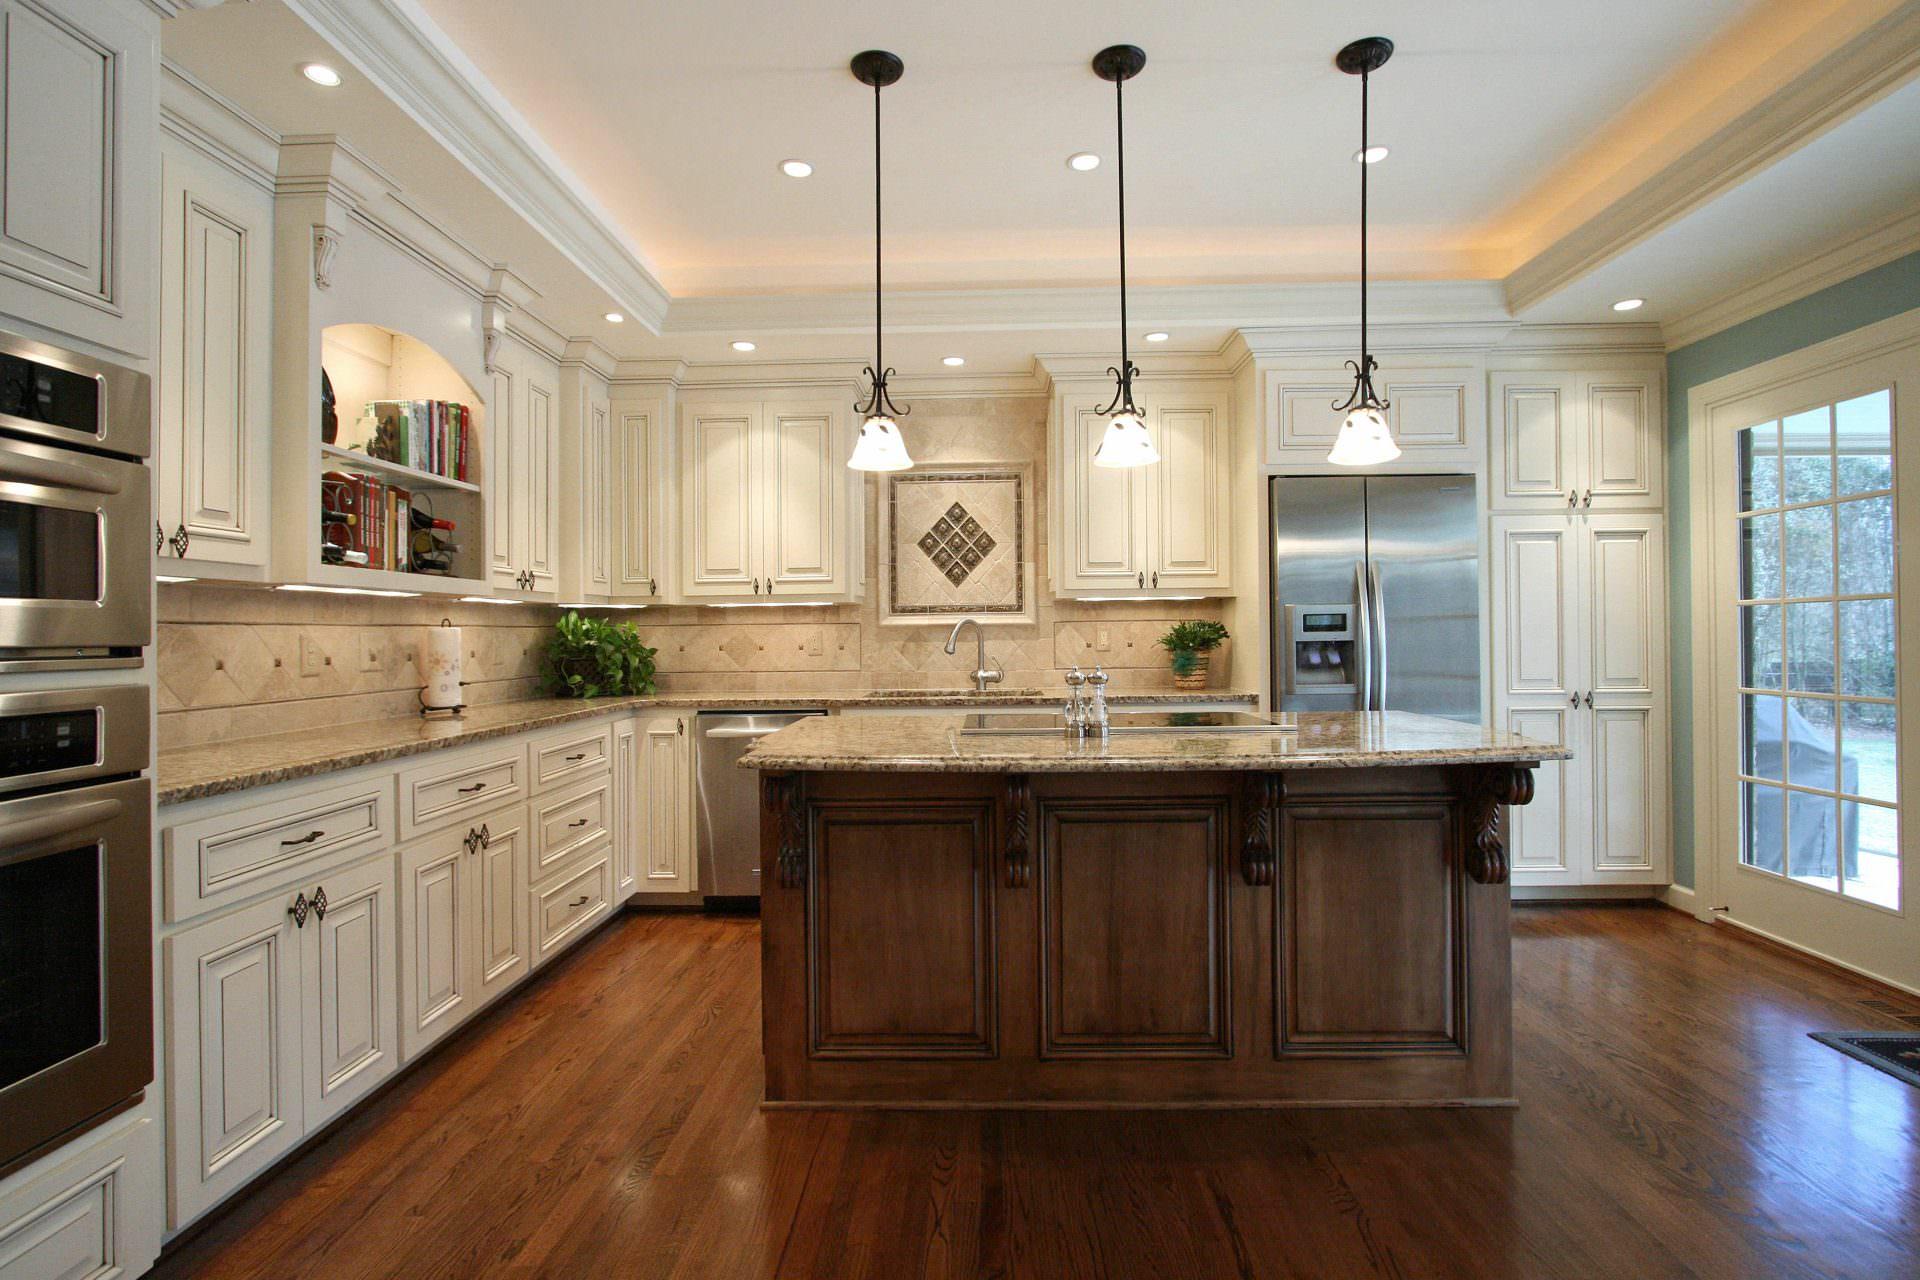 kitchen,island,corbels,display shelves,tile backsplash,traditional,ideas